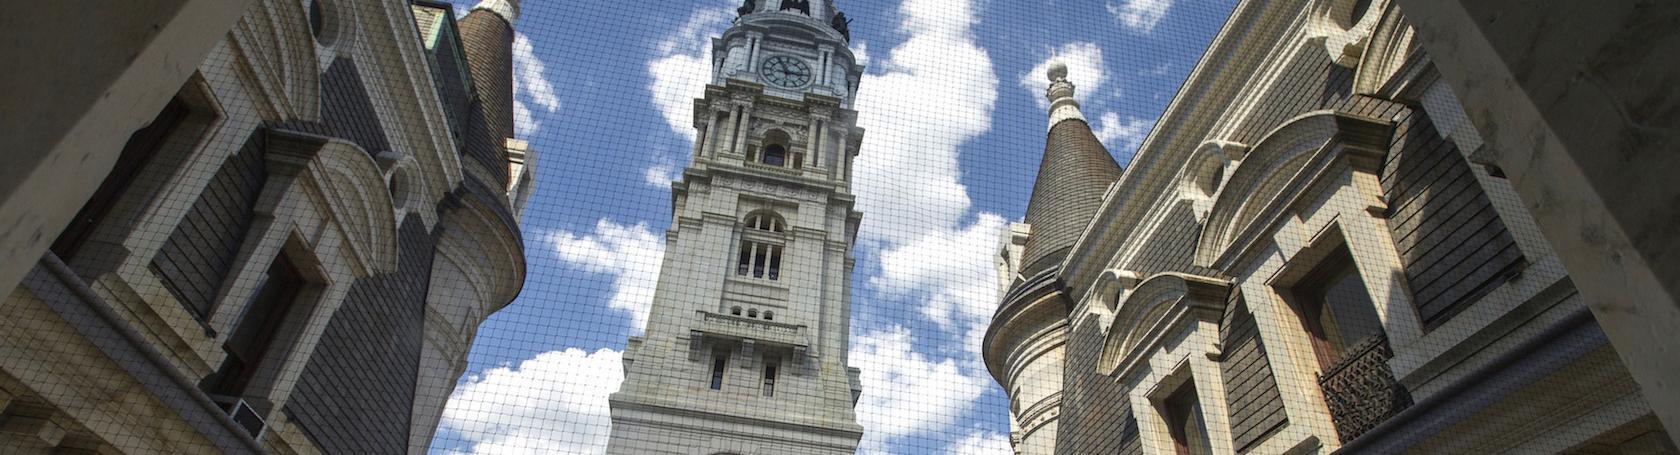 City hall buildings in Philadelphia, PA